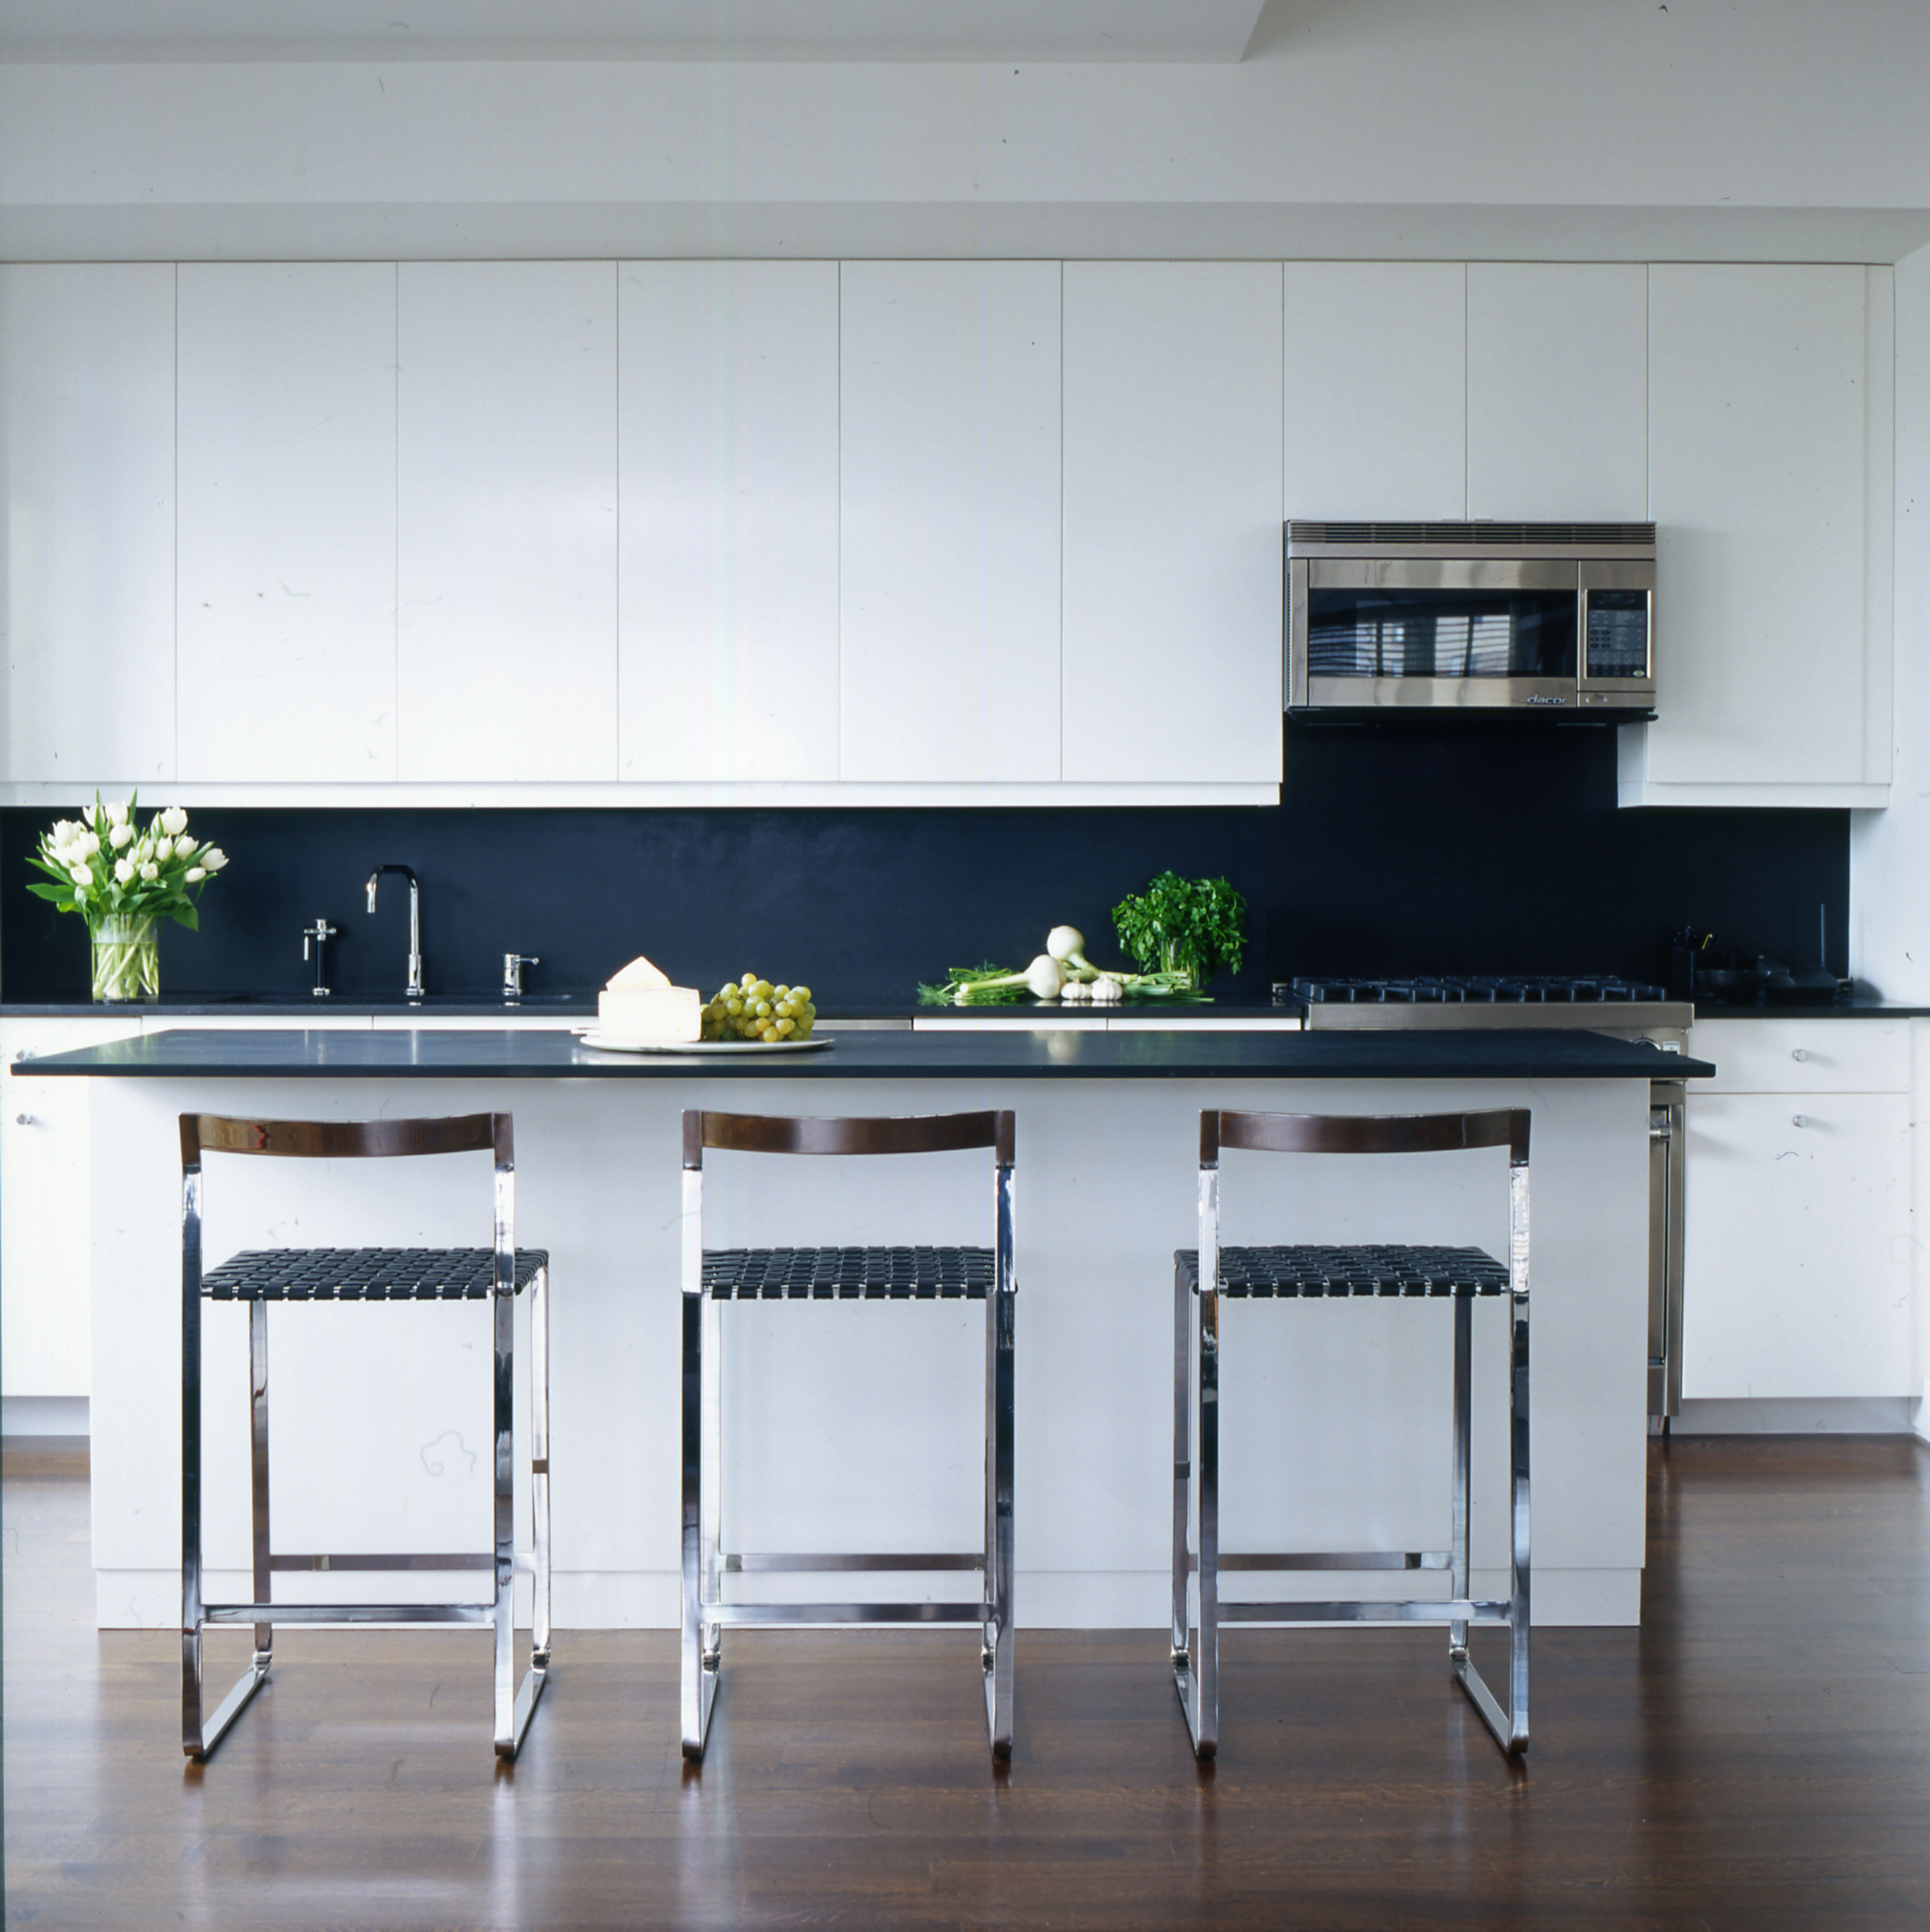 30 Kitchens with Large Center Islands | cottages | Pinterest ...